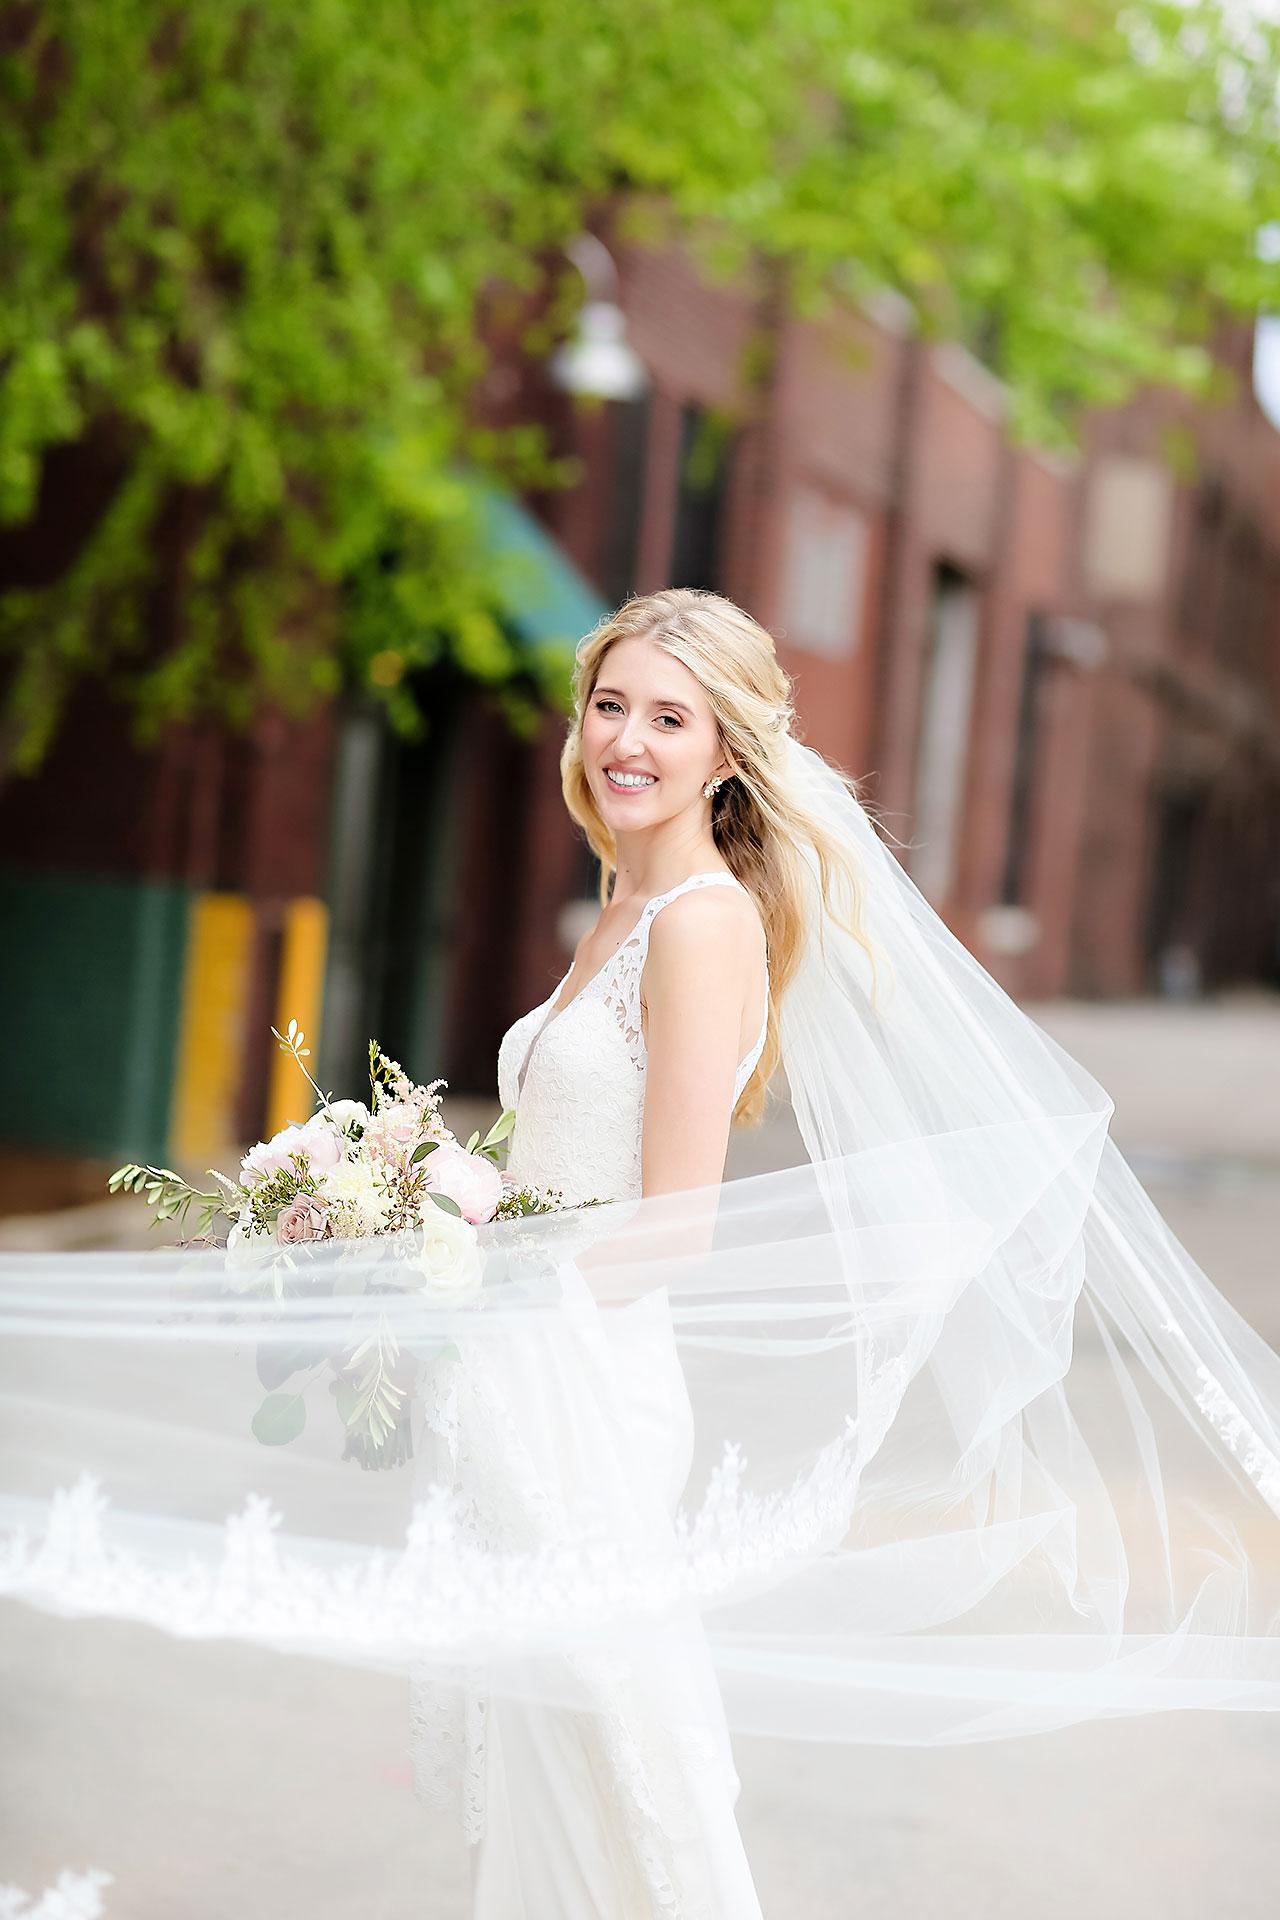 Allison Jeff Union Station Crowne Plaza Indianapolis wedding 162